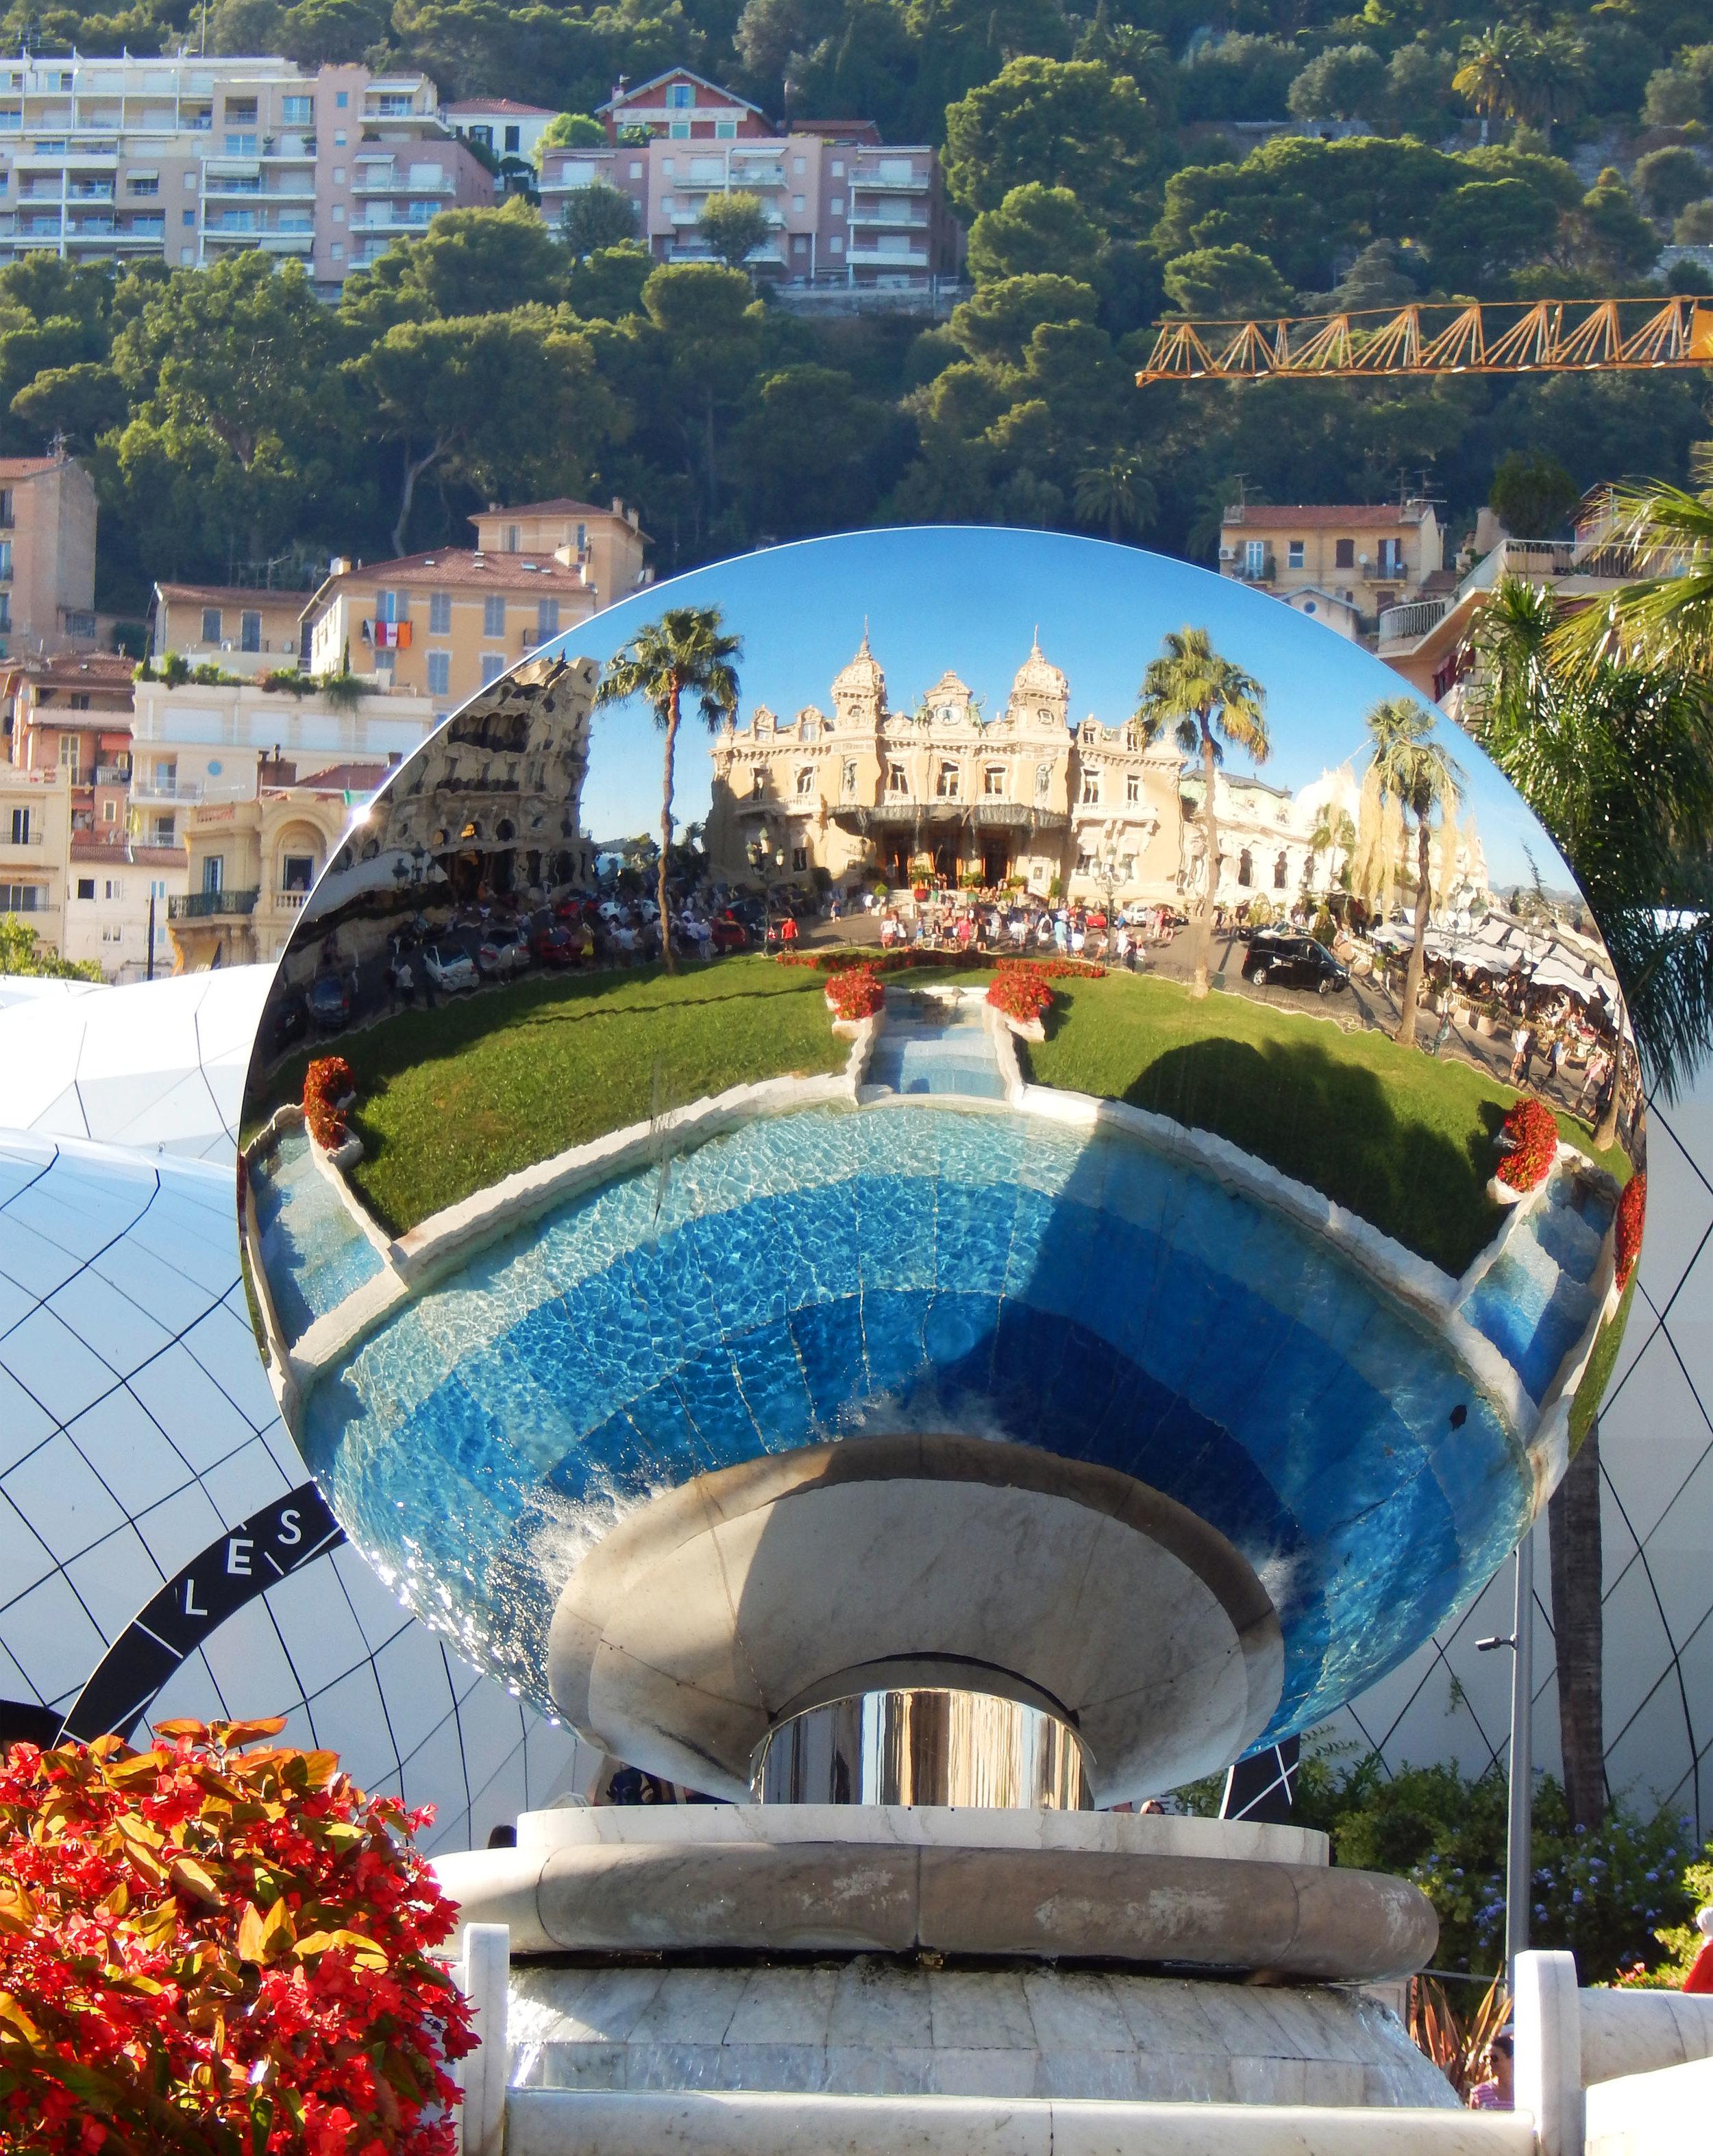 Monaco reflection